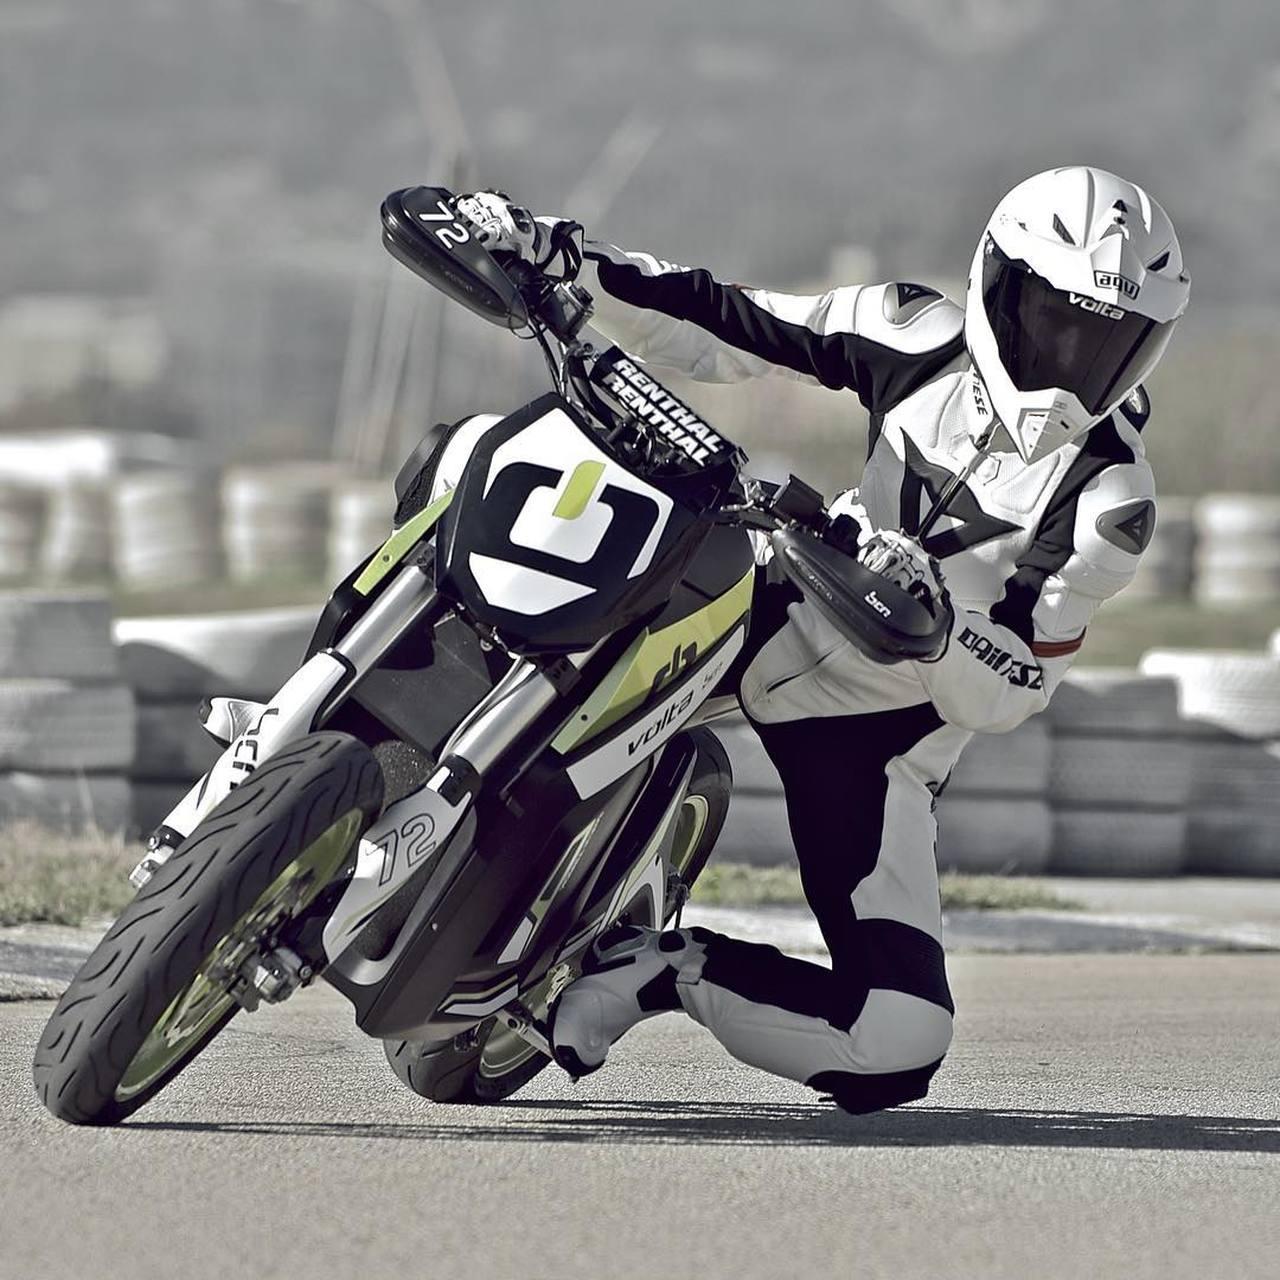 Volta BCN Sport SUPERMOTARD  - Foto 1